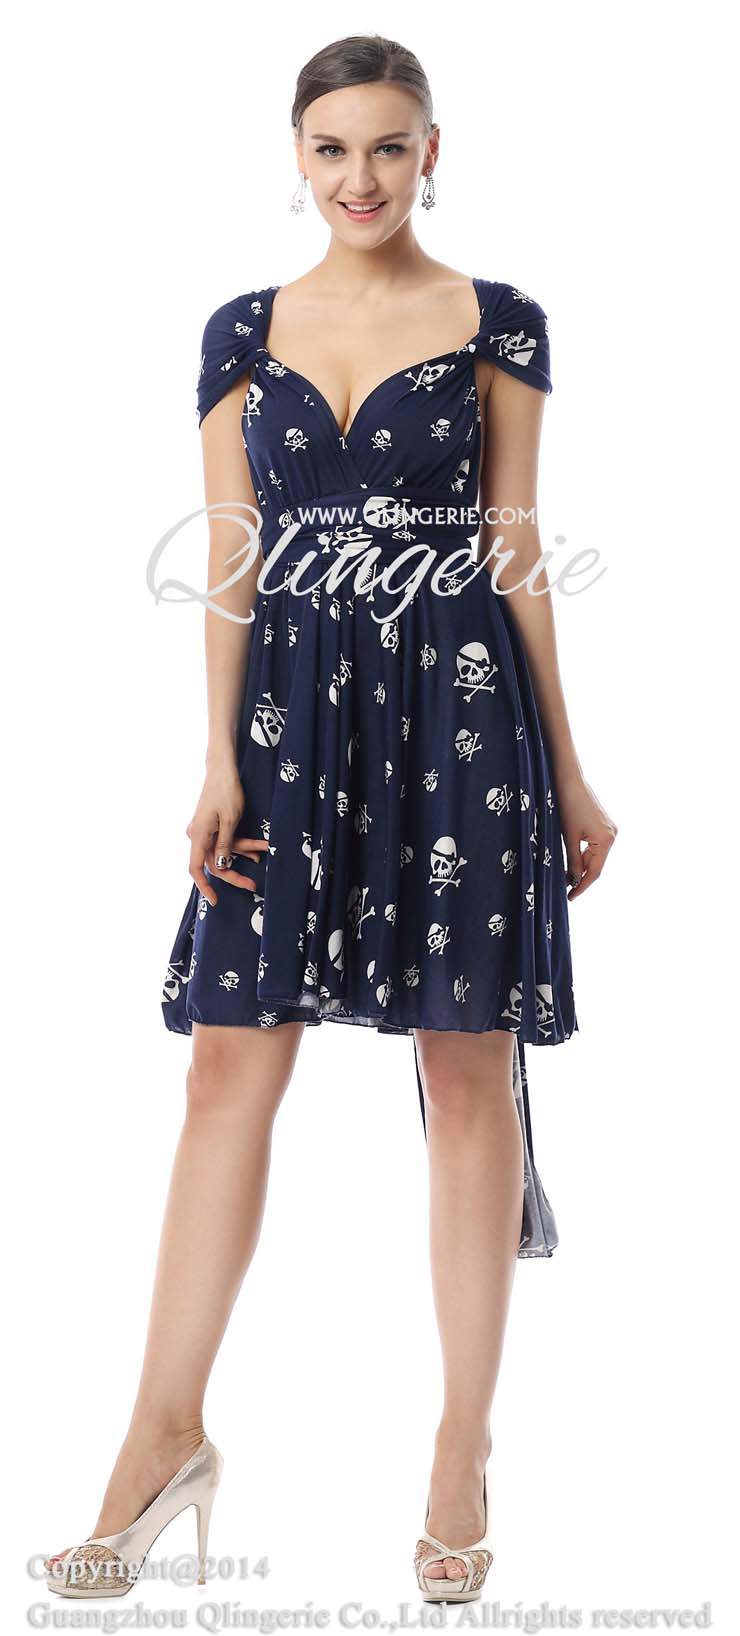 Used Cocktail Dresses - Fn Dress